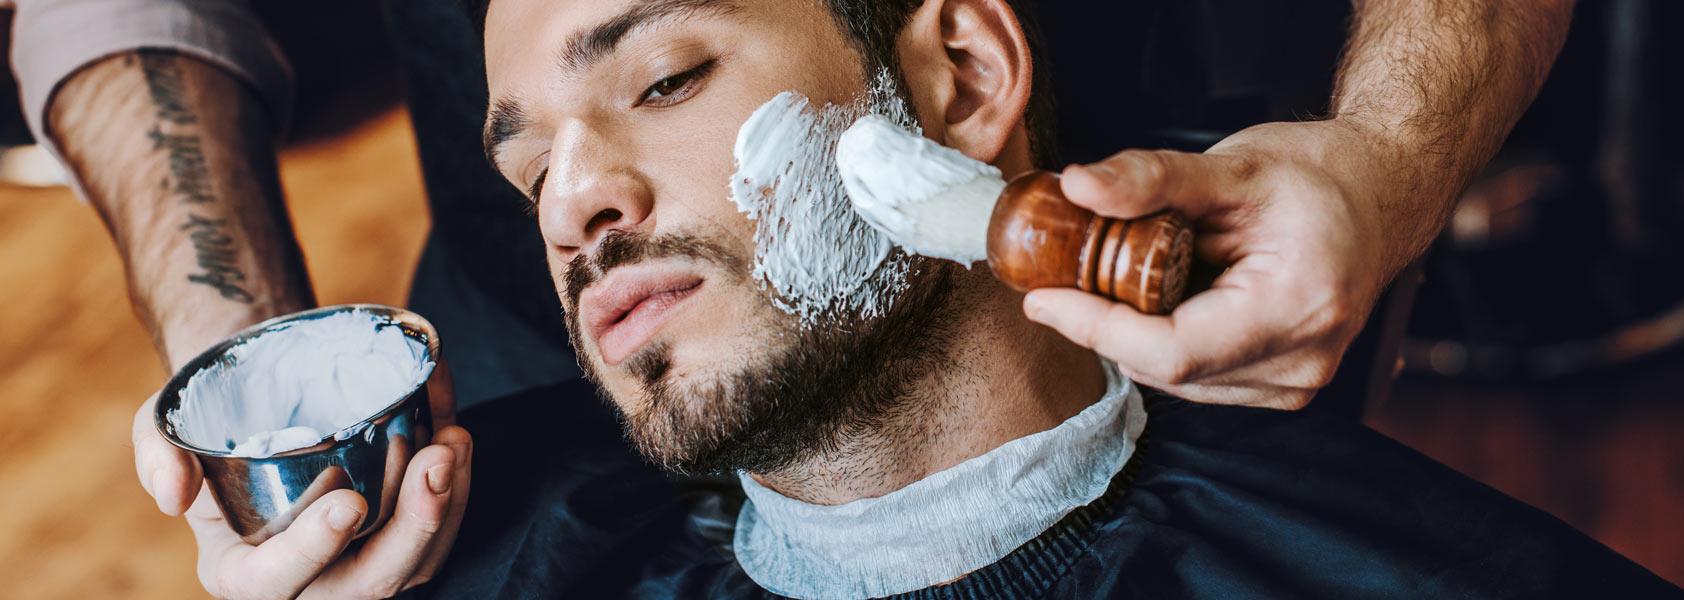 Barber Applying Shaving Cream To Customer Face